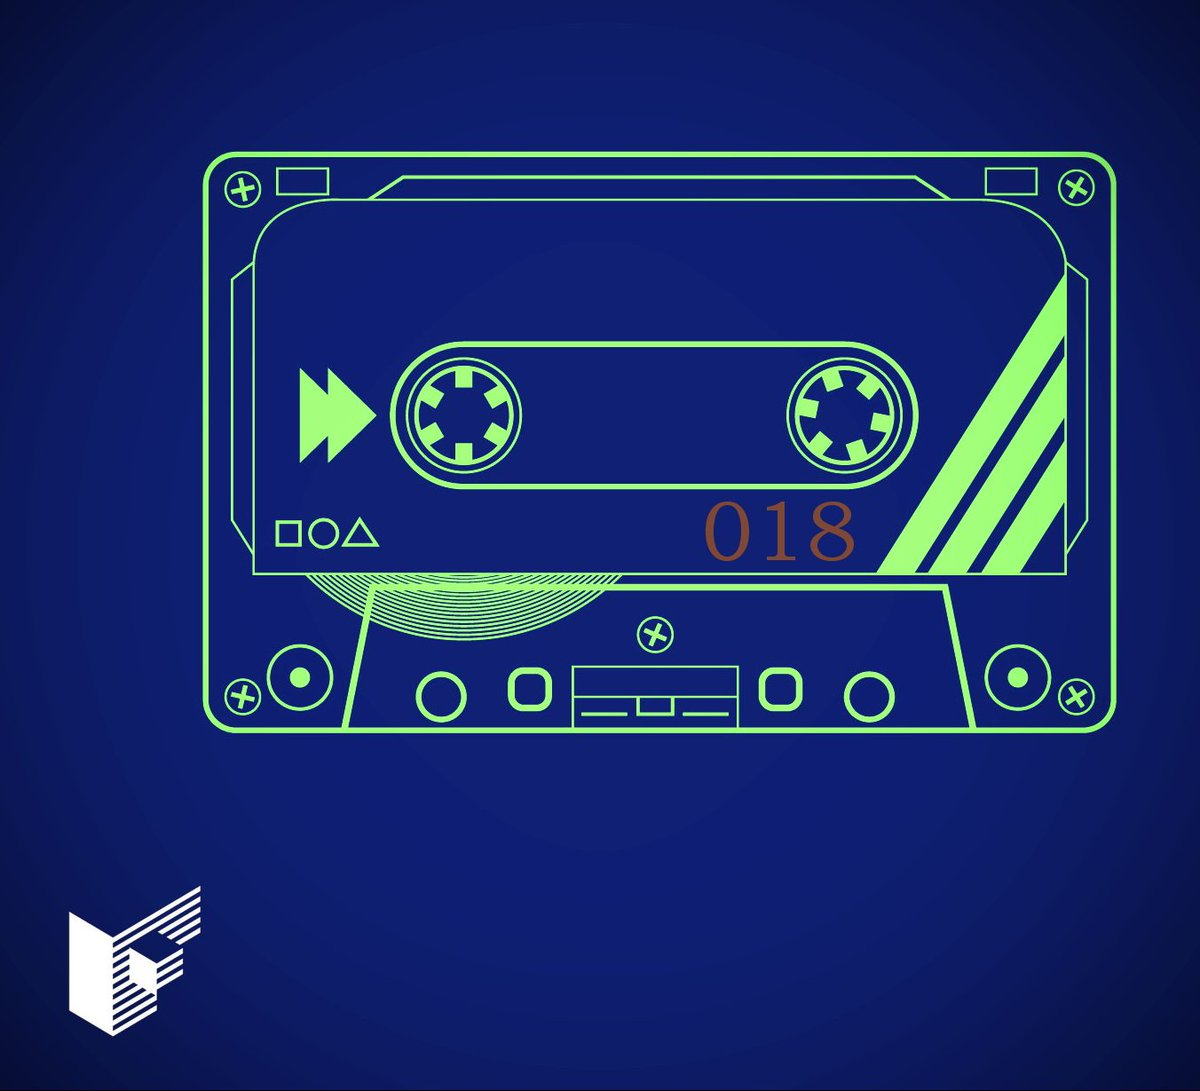 DISCO FUSION 018 mixed by Denis La Funk  https:// soundcloud.com/denislafunk/di scofusion018mix &nbsp; …  #nudisco #mixtape #disco #house #80s @DriveMusicRadio  #80s #synthwave #funk<br>http://pic.twitter.com/aerkXU53Fe